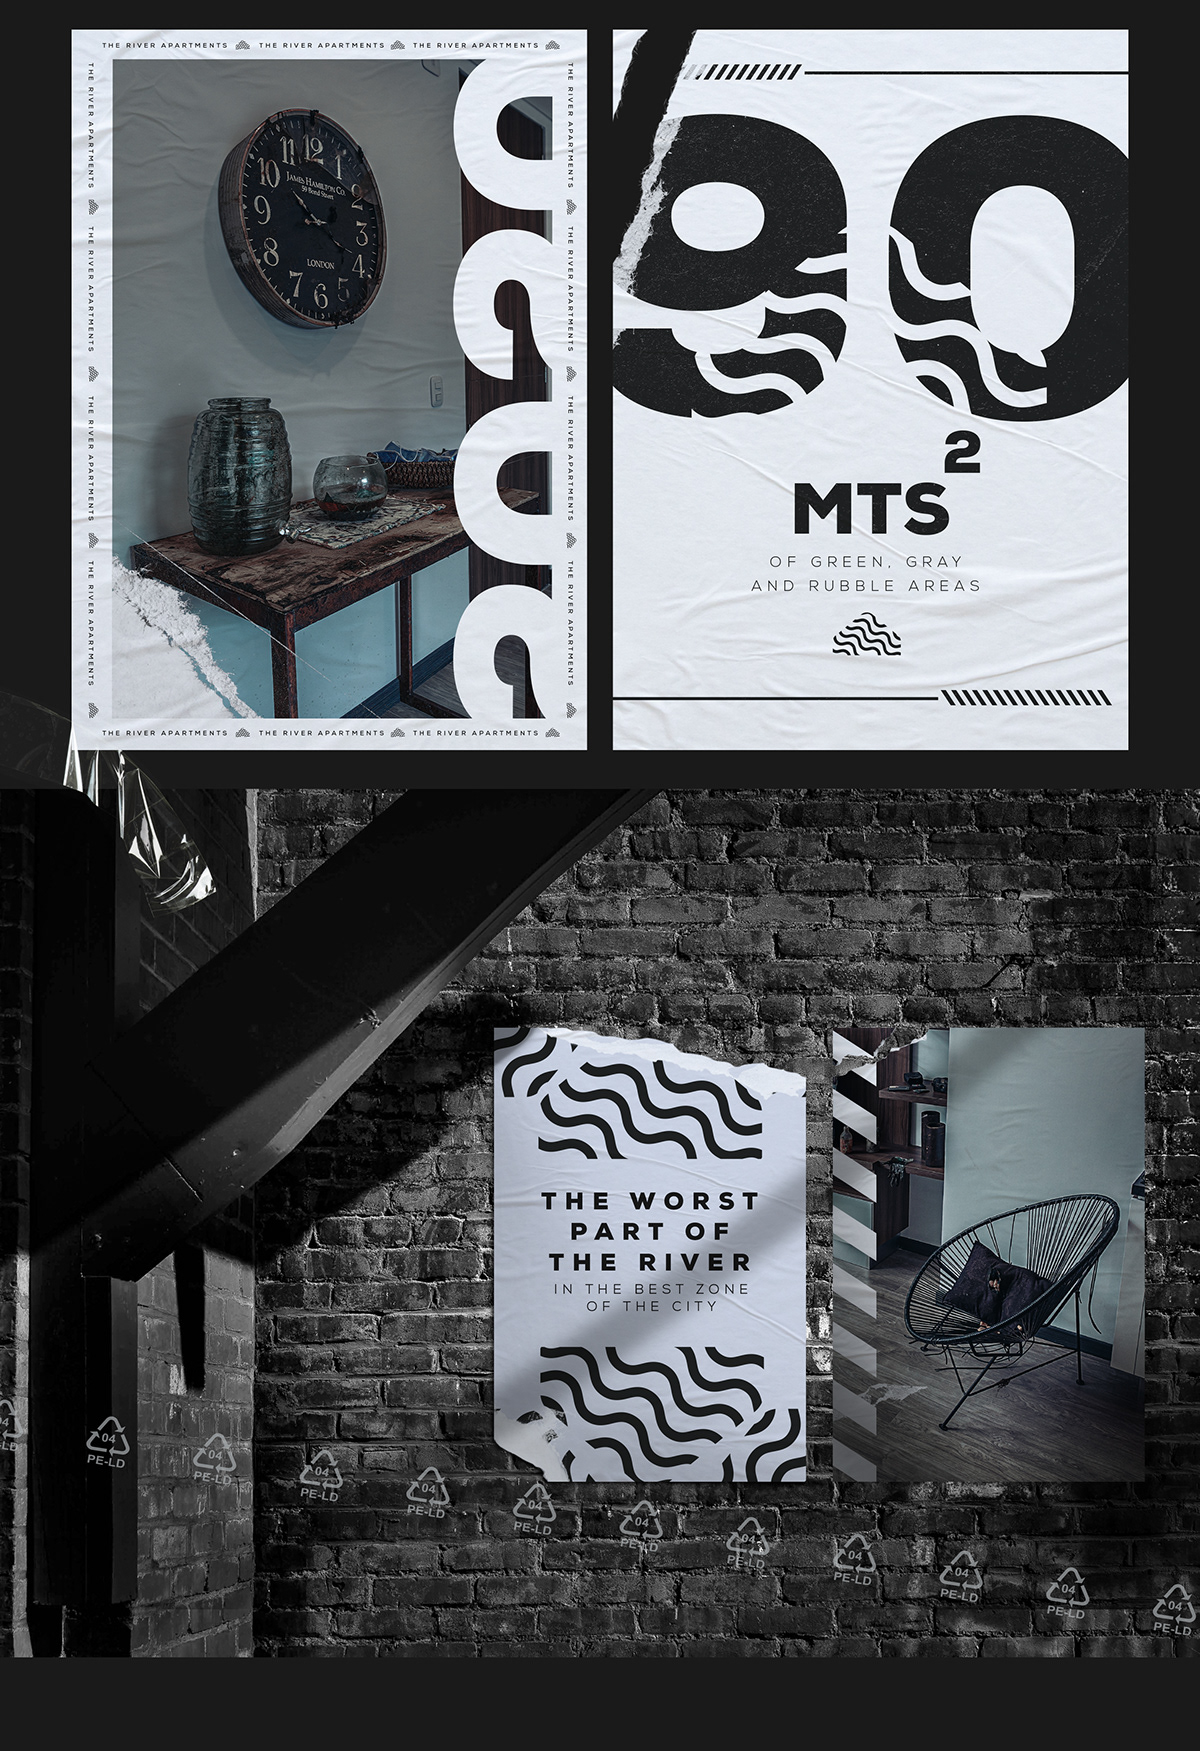 Advertisign design